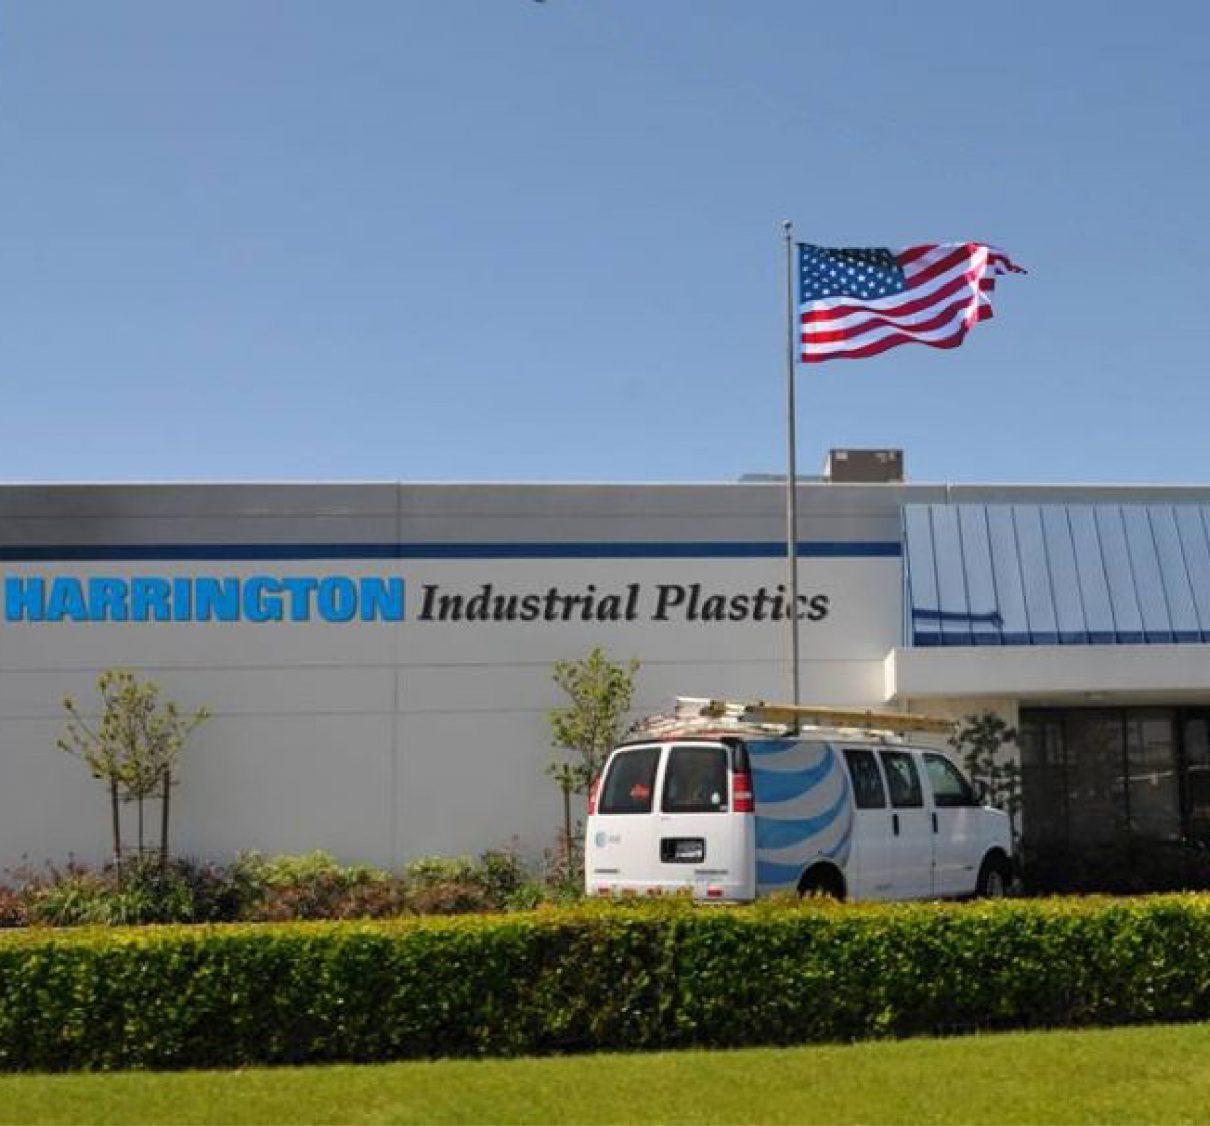 harrington-industrial-plastics-office@2x